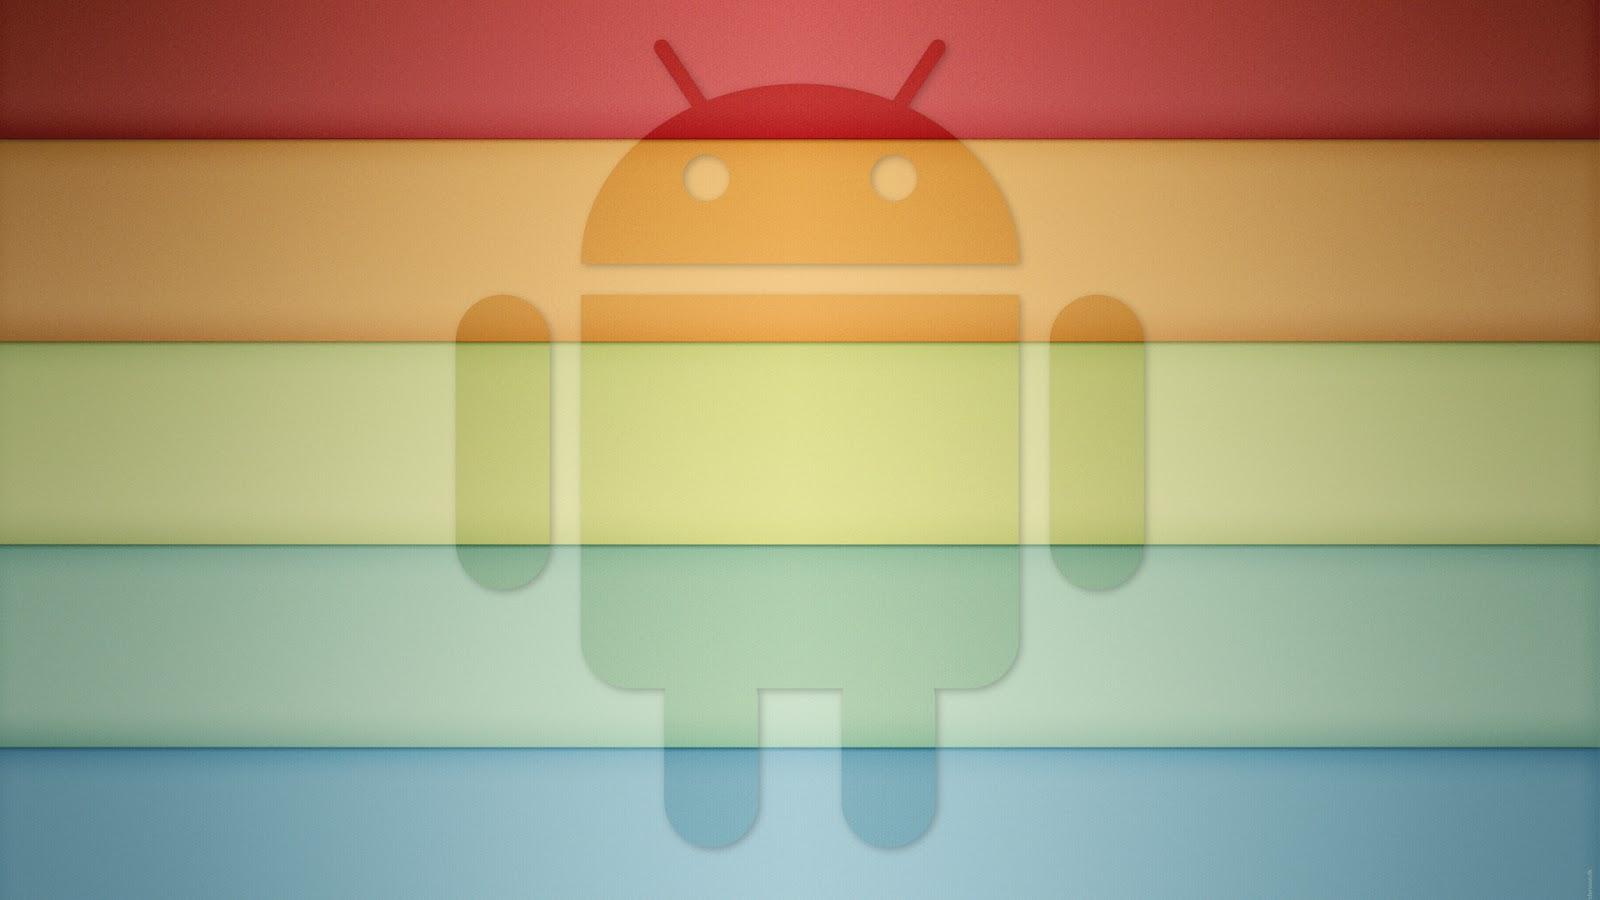 http://3.bp.blogspot.com/-1siCrigic2A/T-yFqiZAr-I/AAAAAAAAAh4/HlOpWunLt5I/s1600/android+HD+Wallpaper+hd.jpg